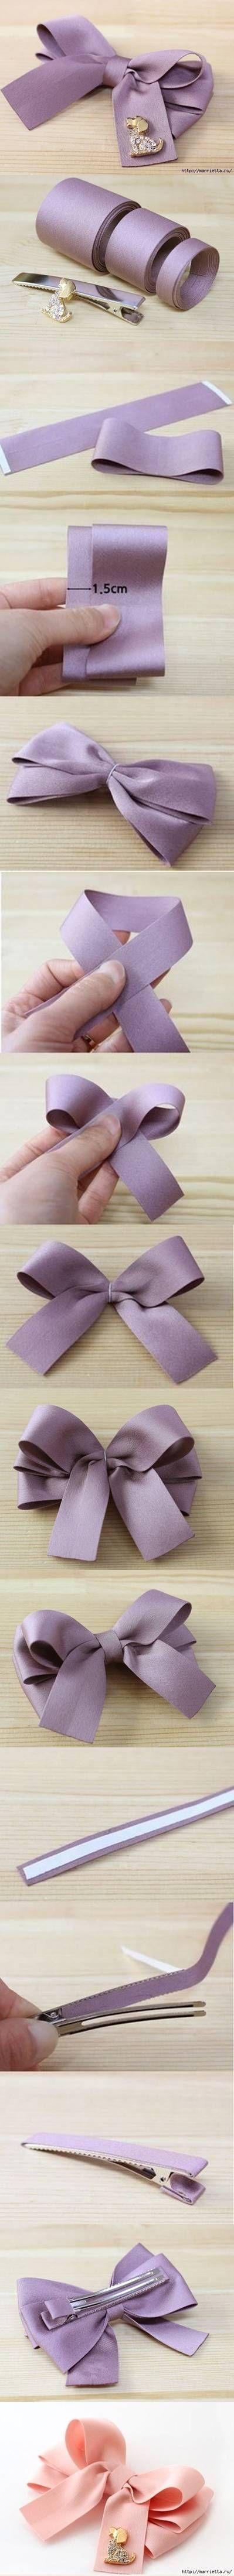 DIY Simple Bow Hairpin DIY Projects | UsefulDIY.com Follow Us on Facebook ==> http://www.facebook.com/UsefulDiy